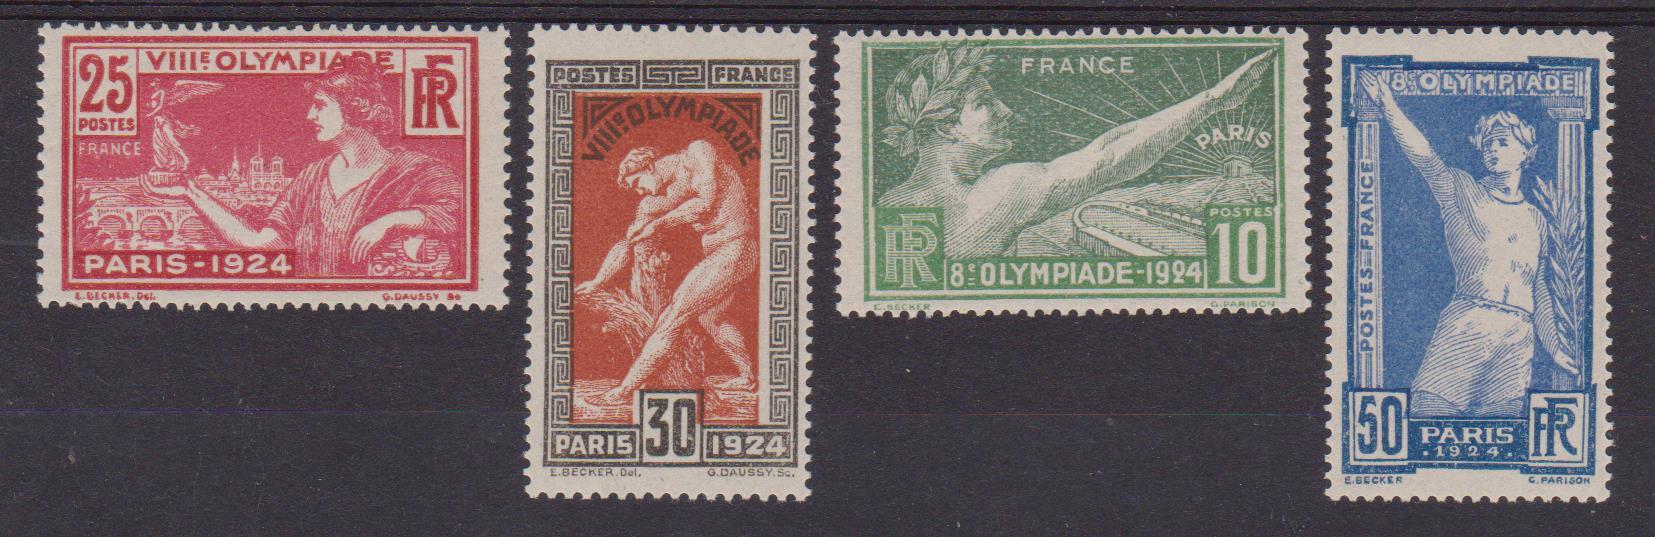 Francia 216-220 001